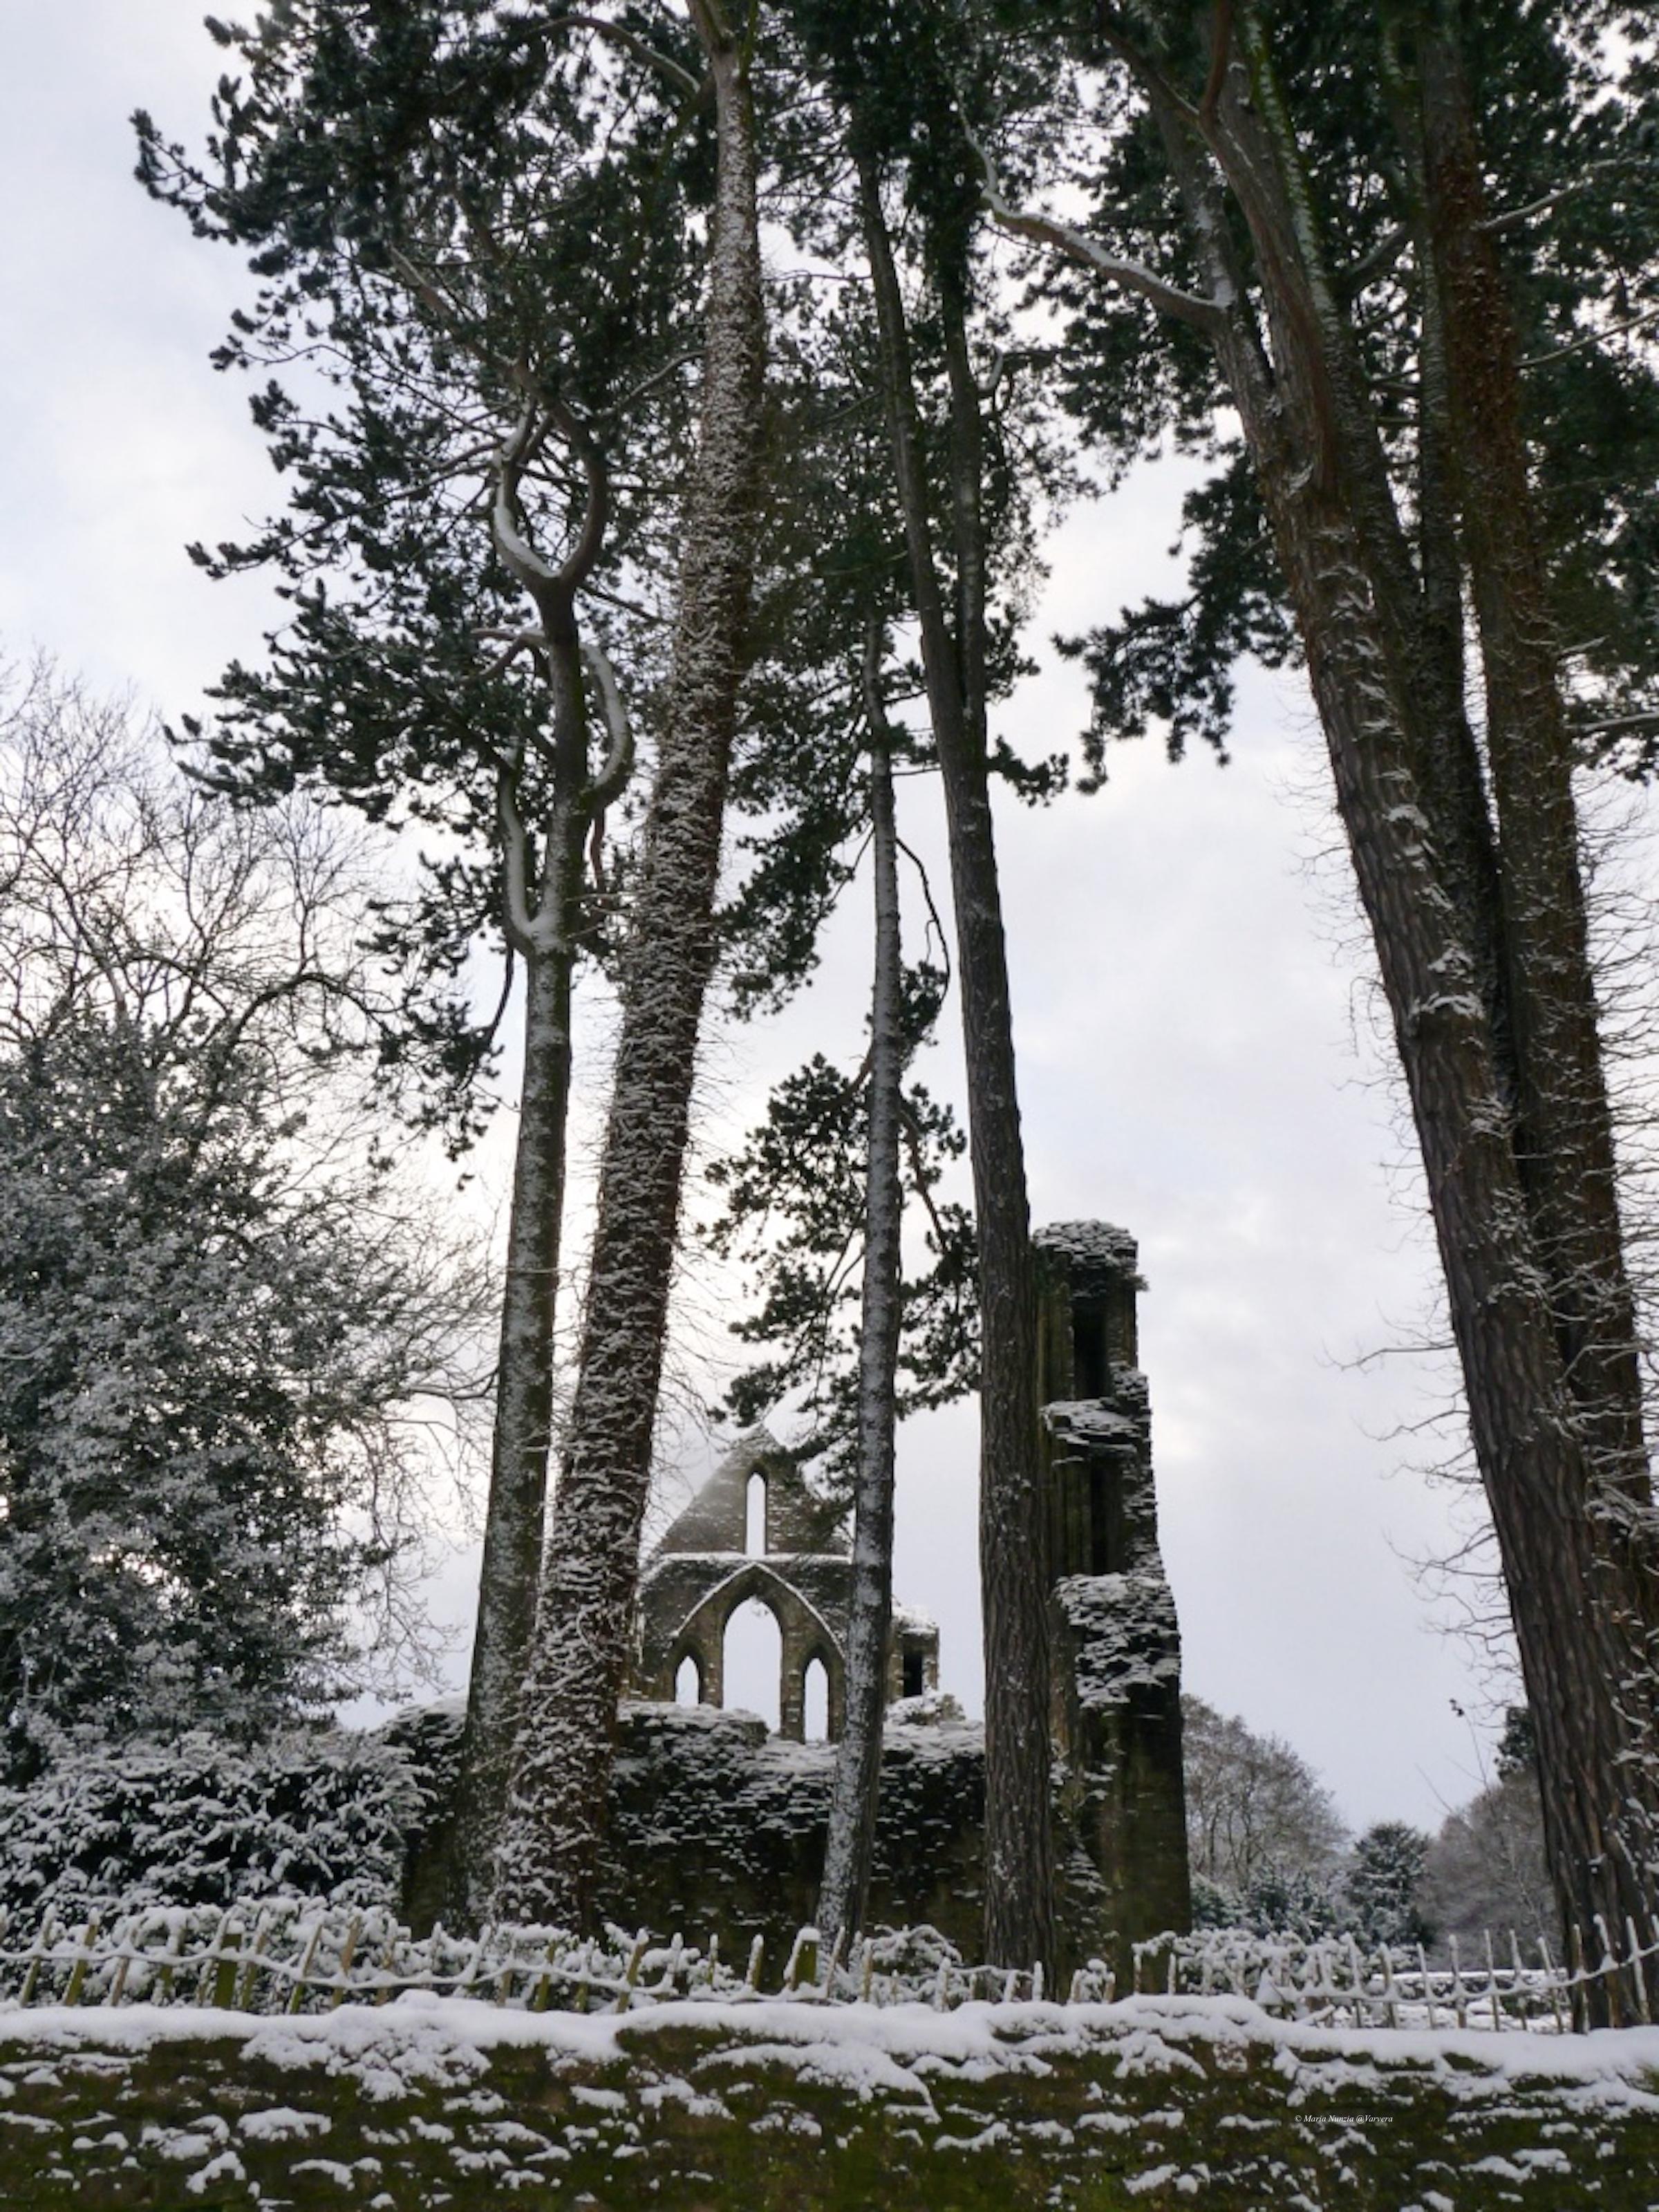 Wenlock_Abbey_in_the_snow_©Maria_Nunzia__Varvera_